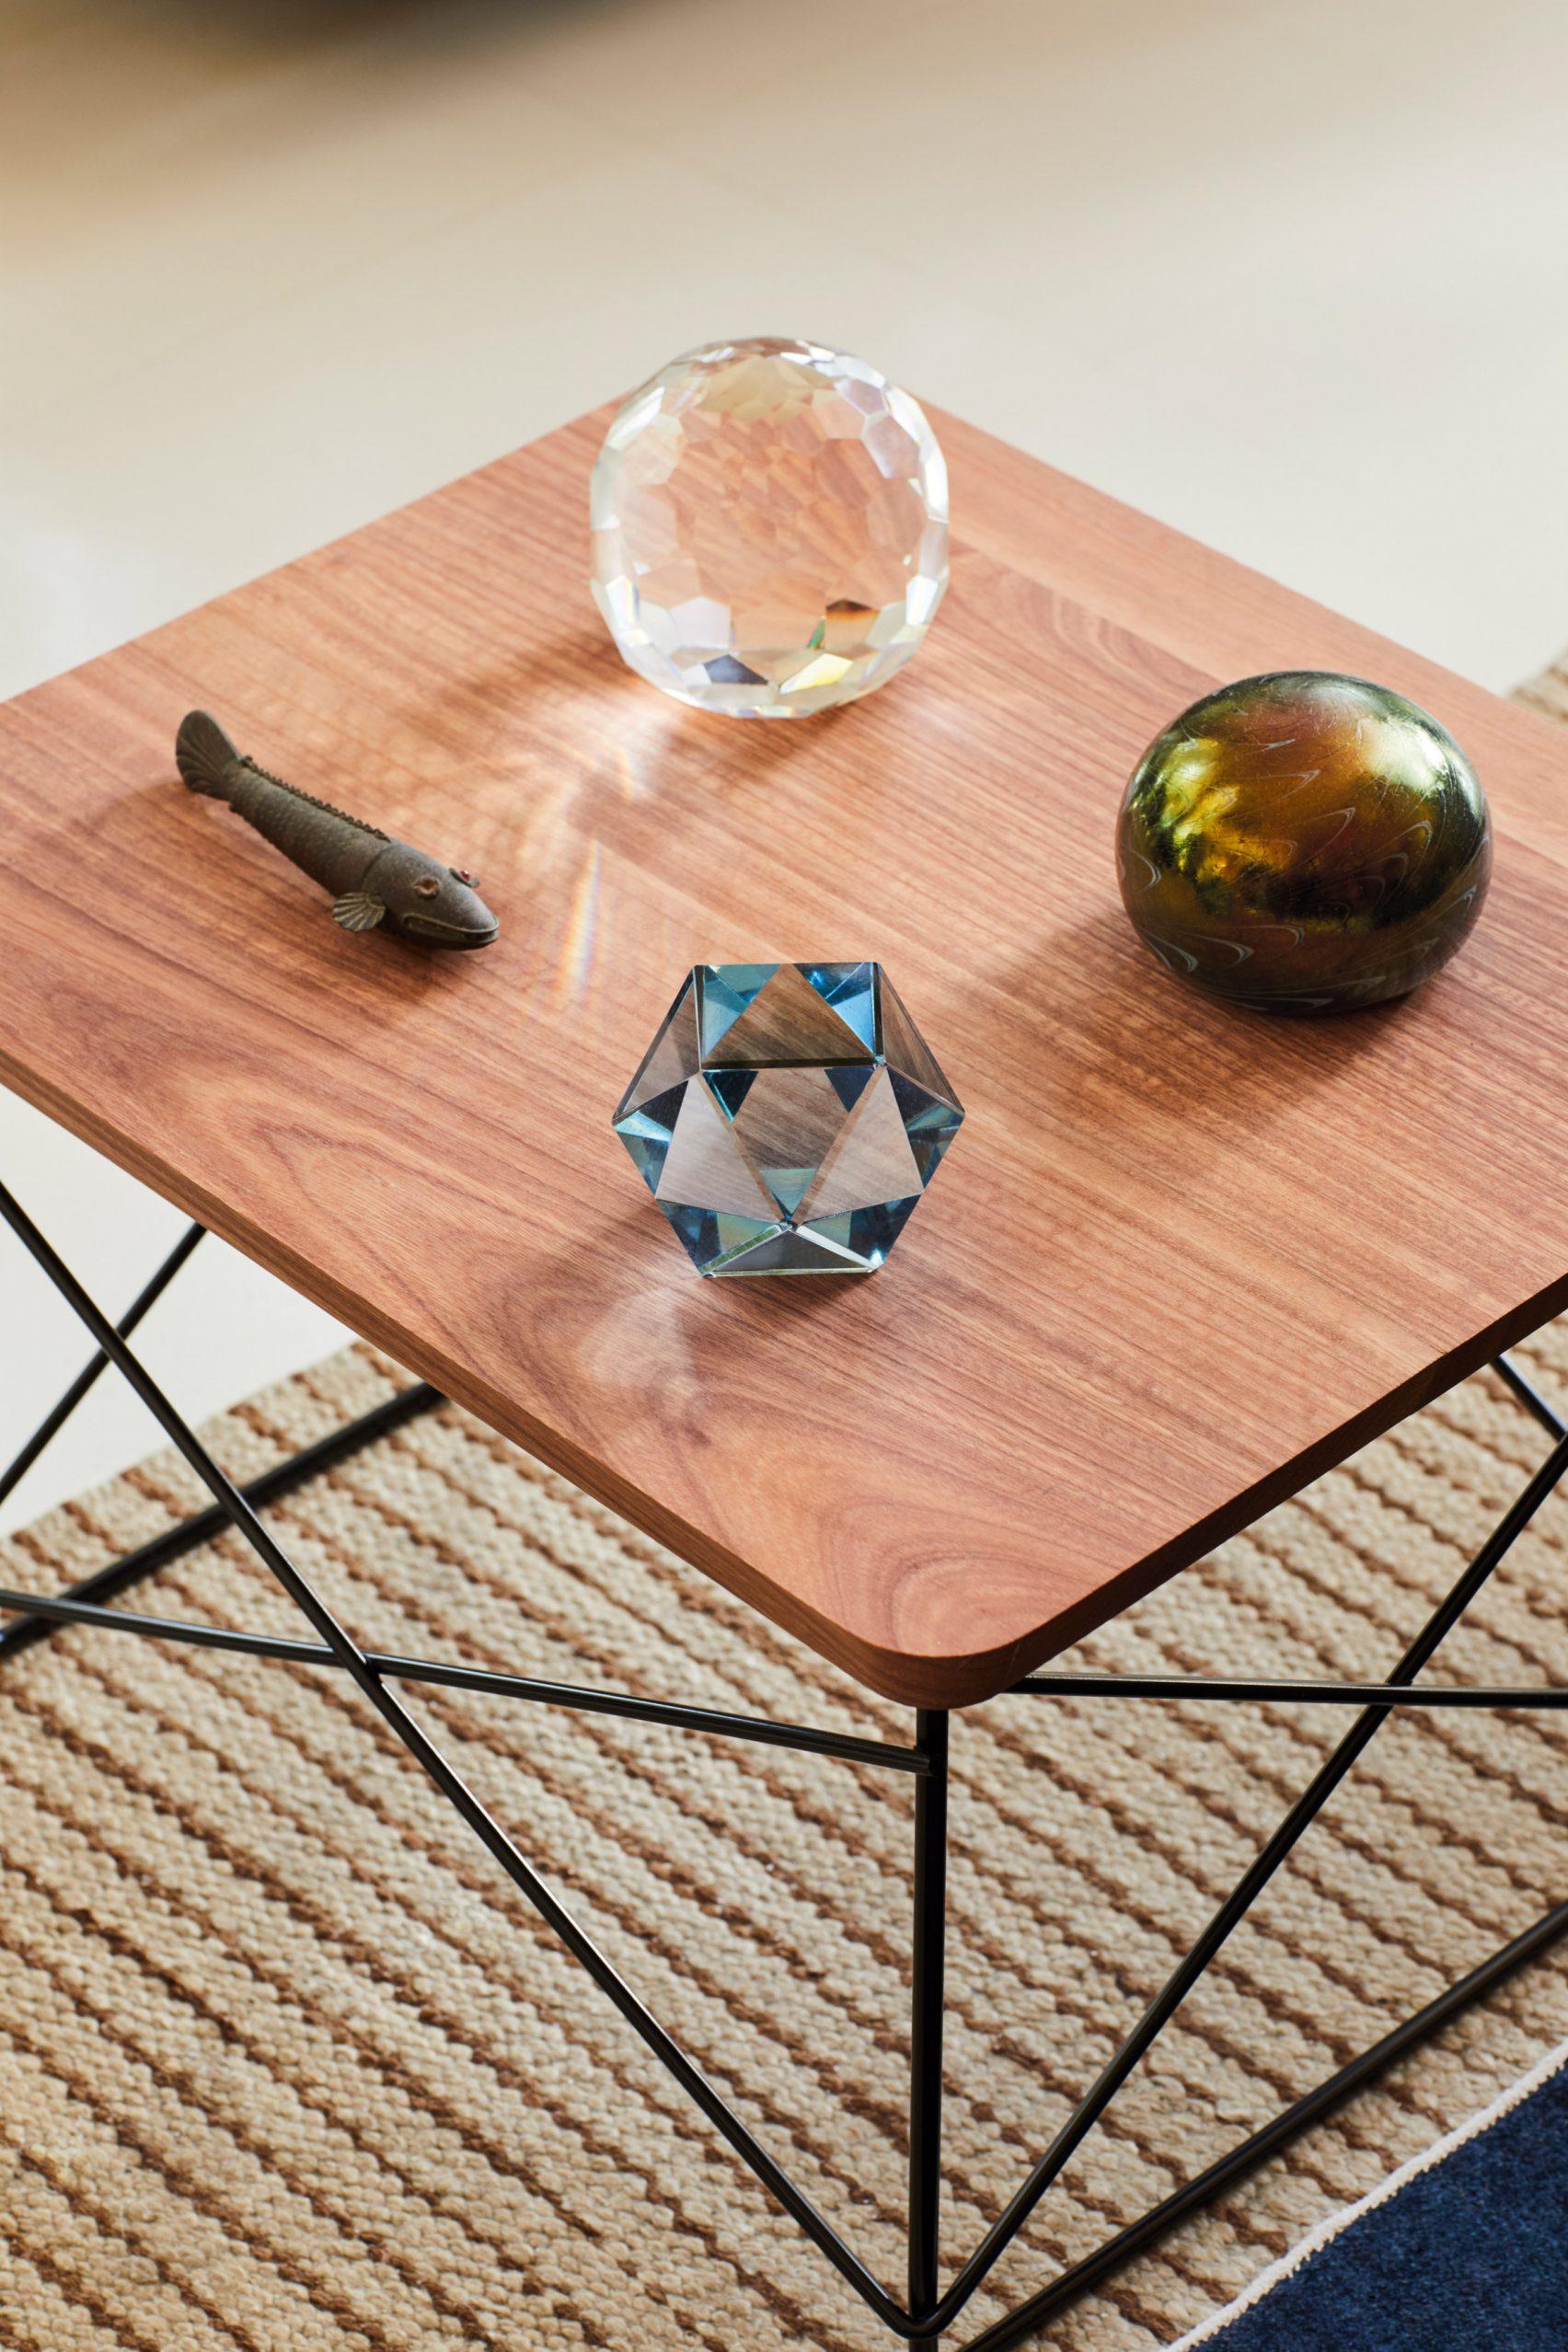 vitra-herman-miller-eames-eucalyptus-ltr-tables-_dezeen_2364_col_0-1704x2556.jpg